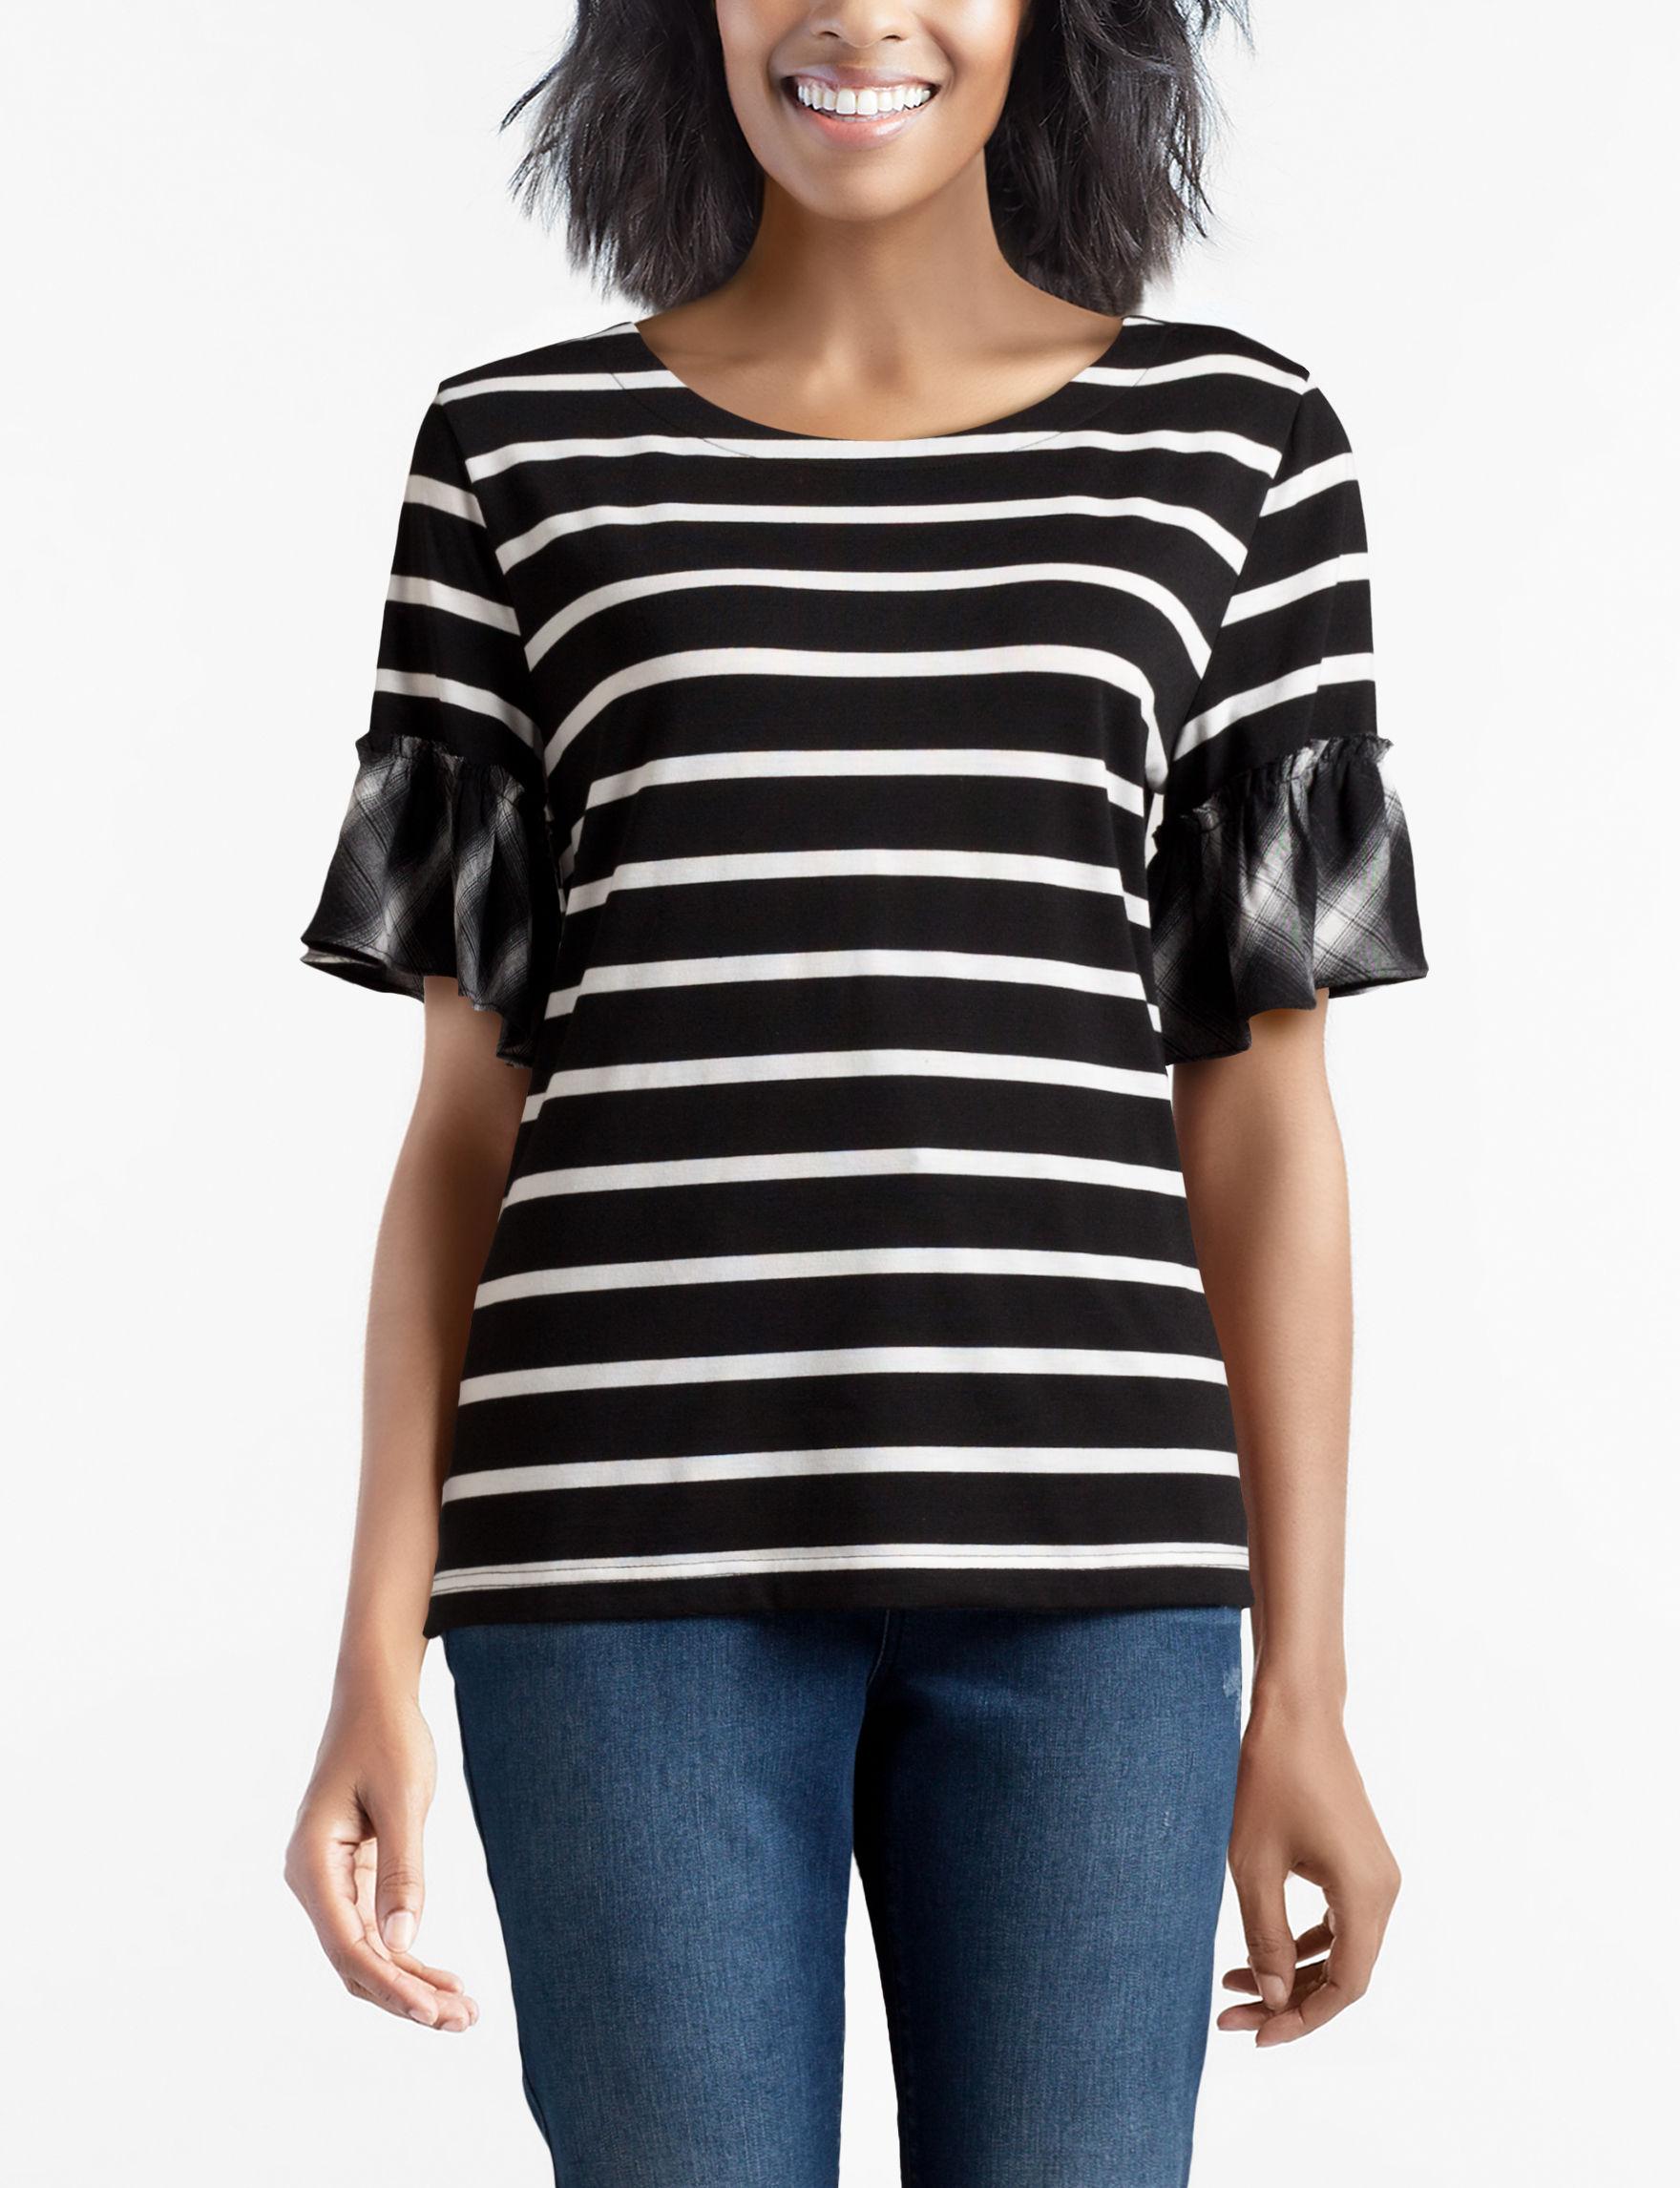 Isela Black Shirts & Blouses